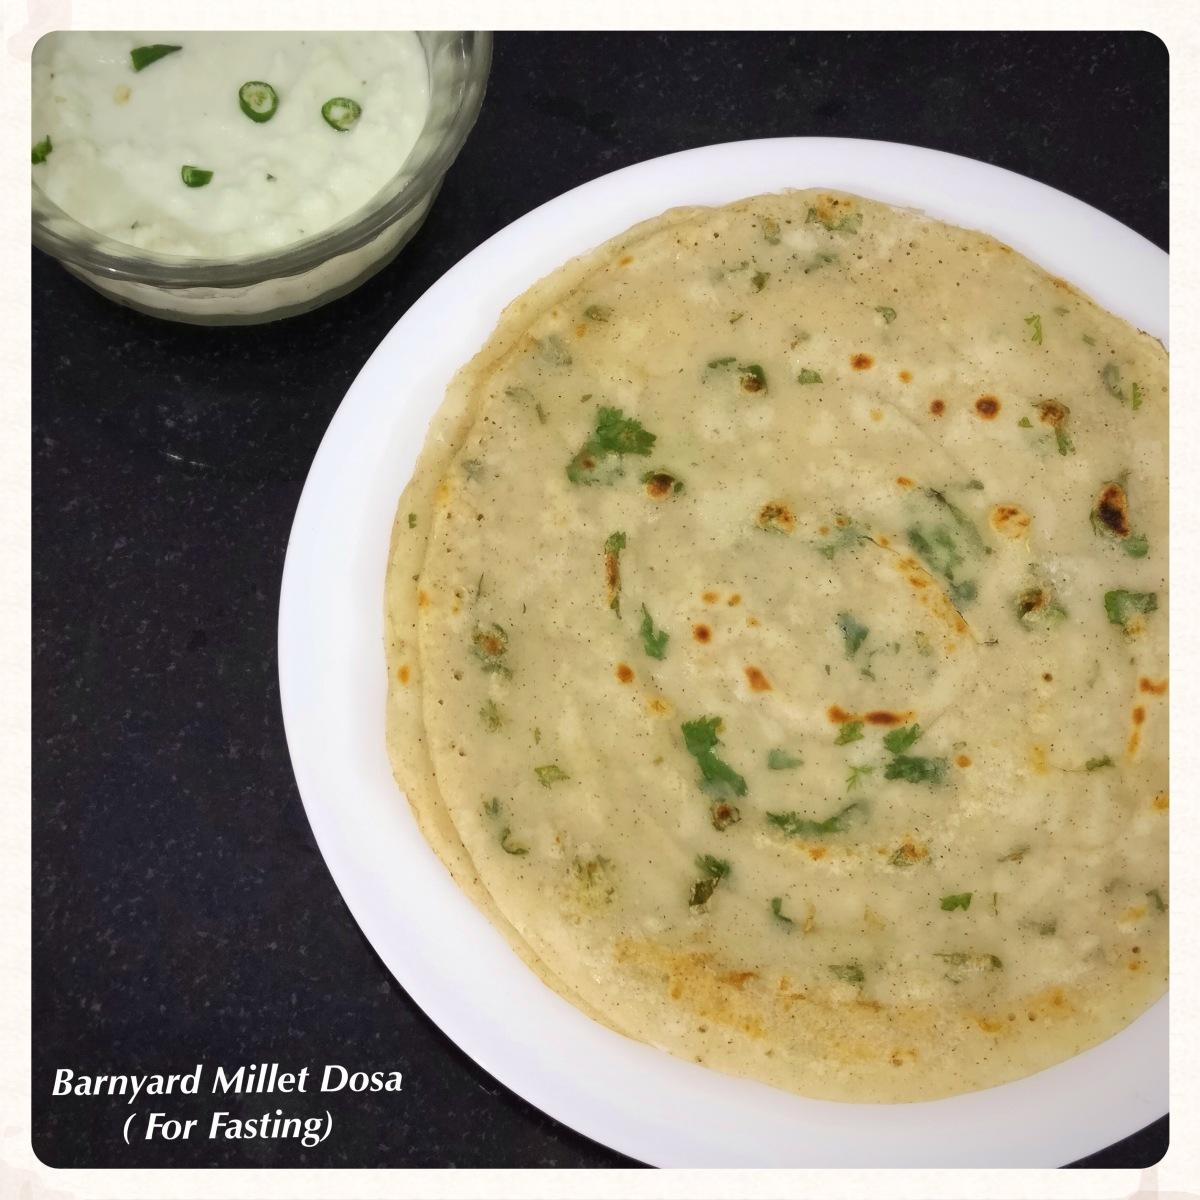 Barnyard Millet Dosa Recipe